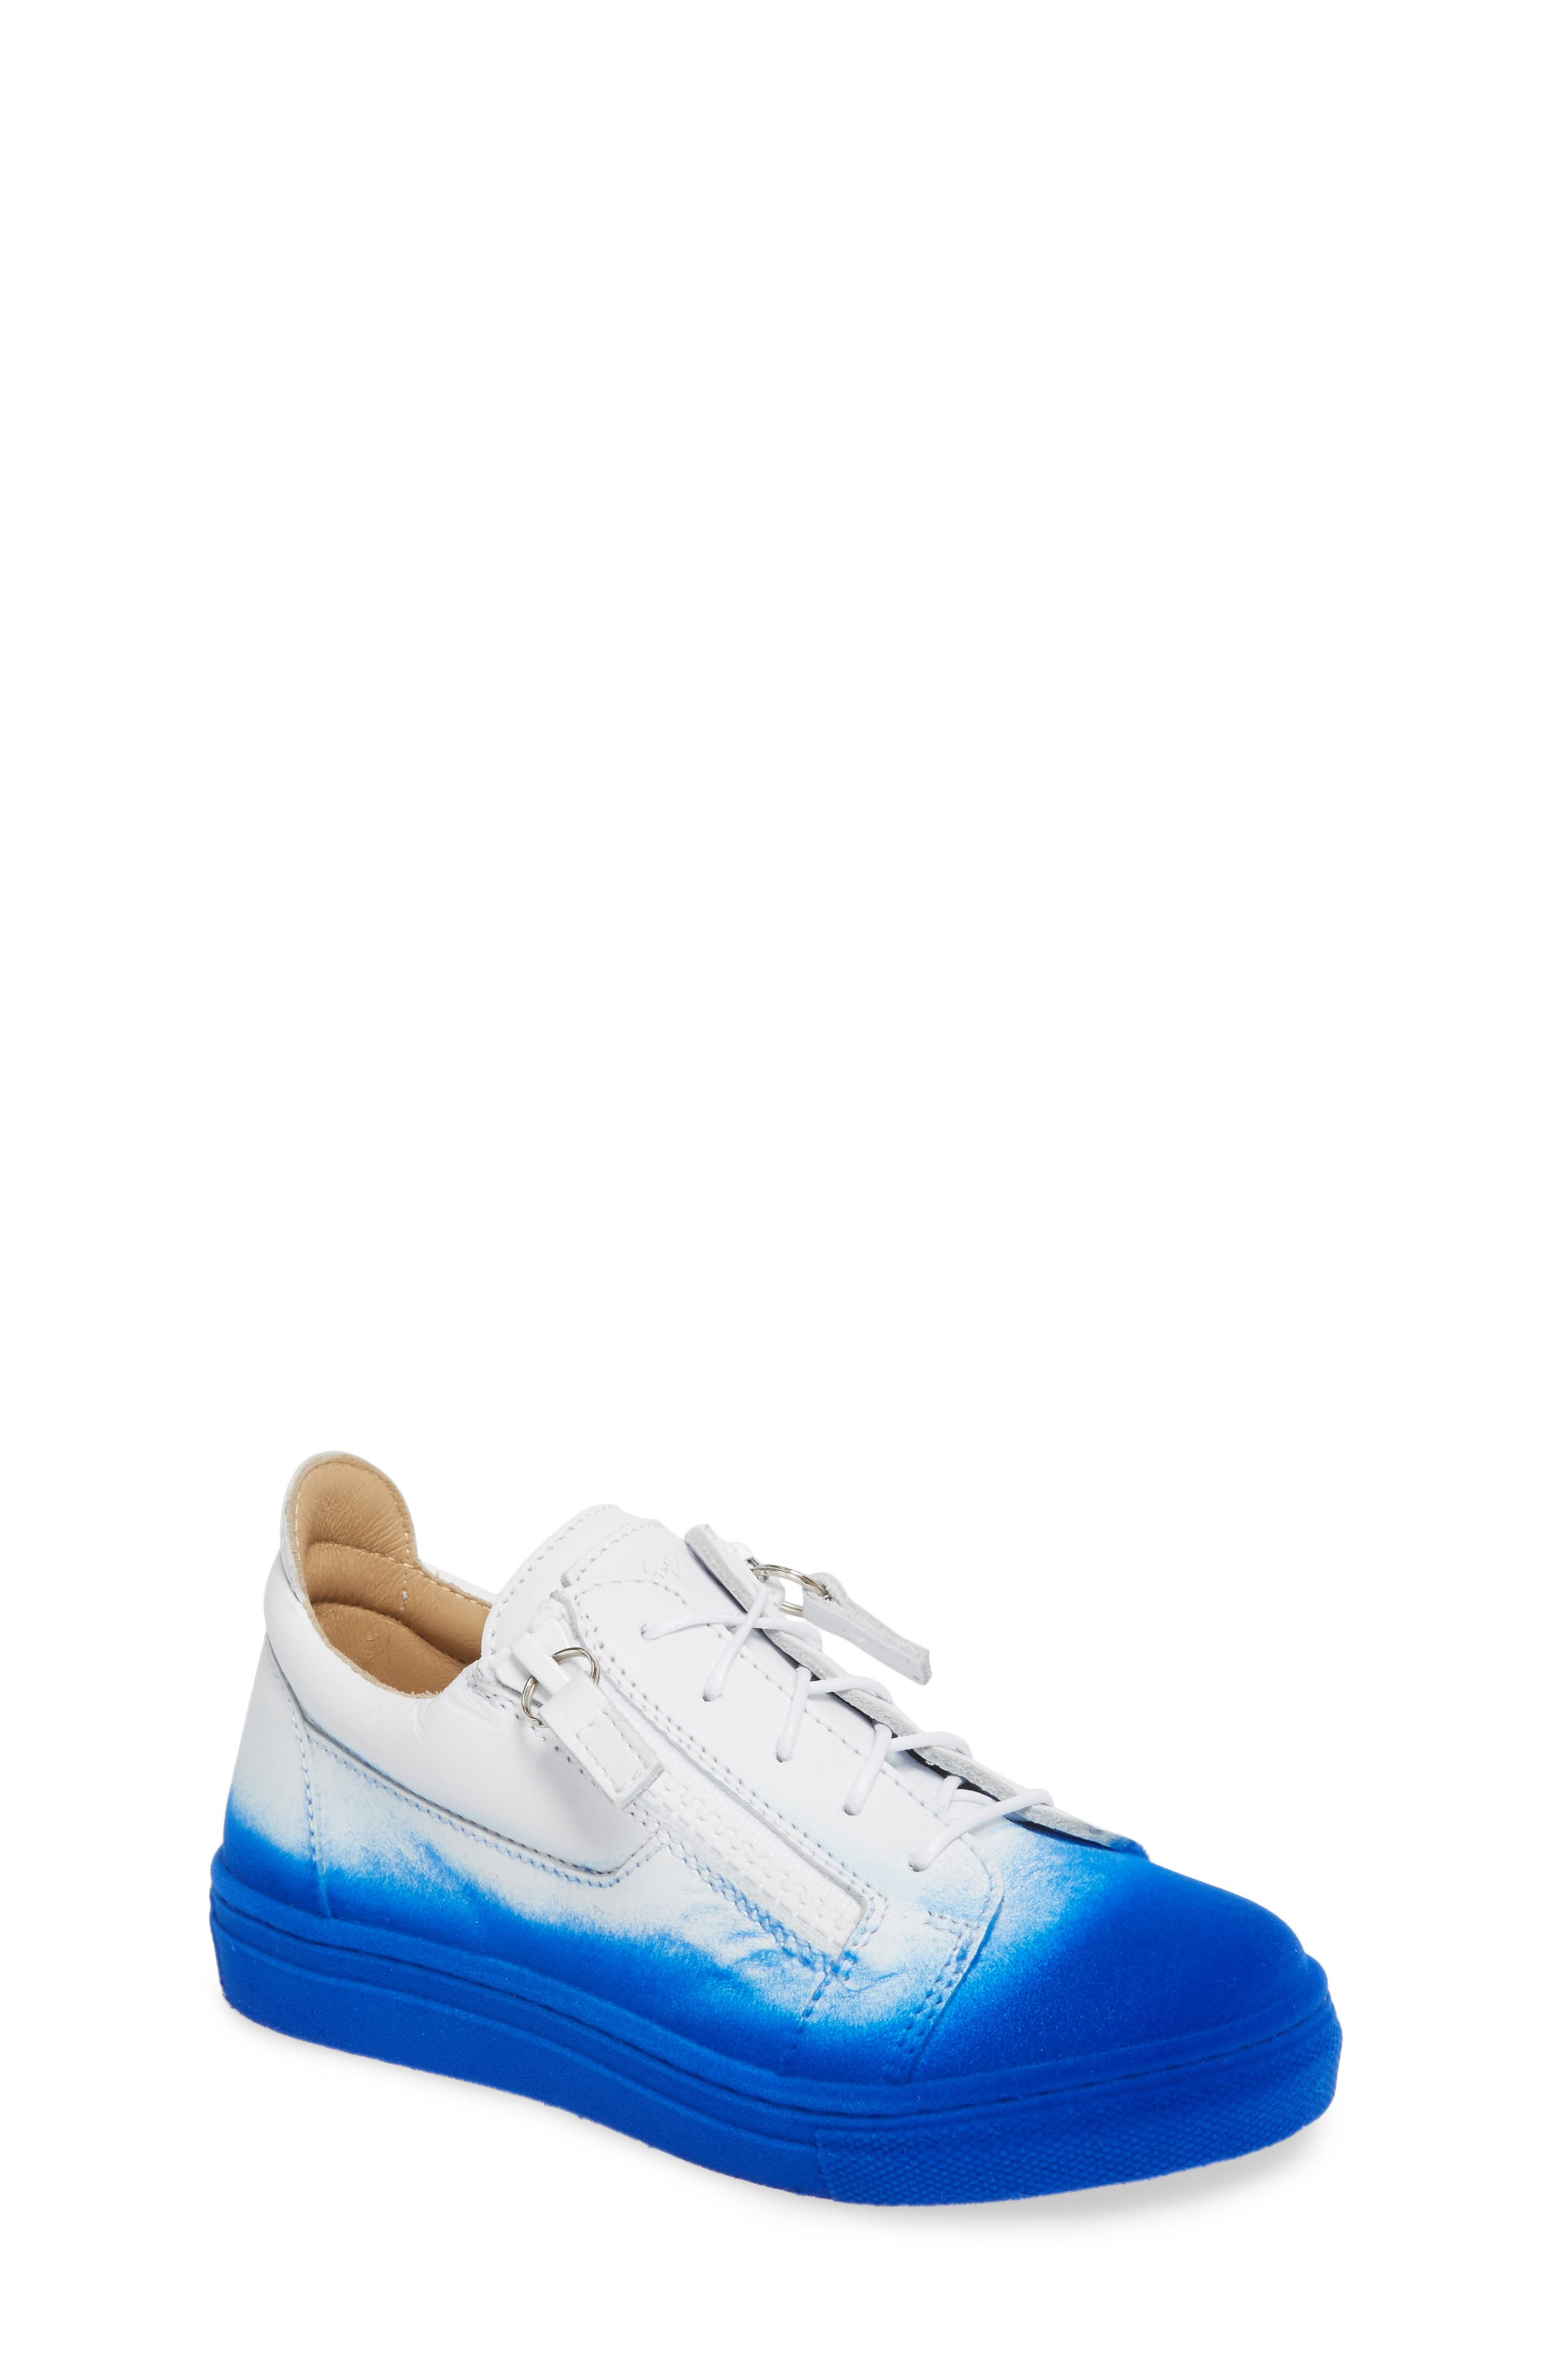 Smuggy Ombré Flocked Sneaker,                         Main,                         color, BLUE/ WHITE